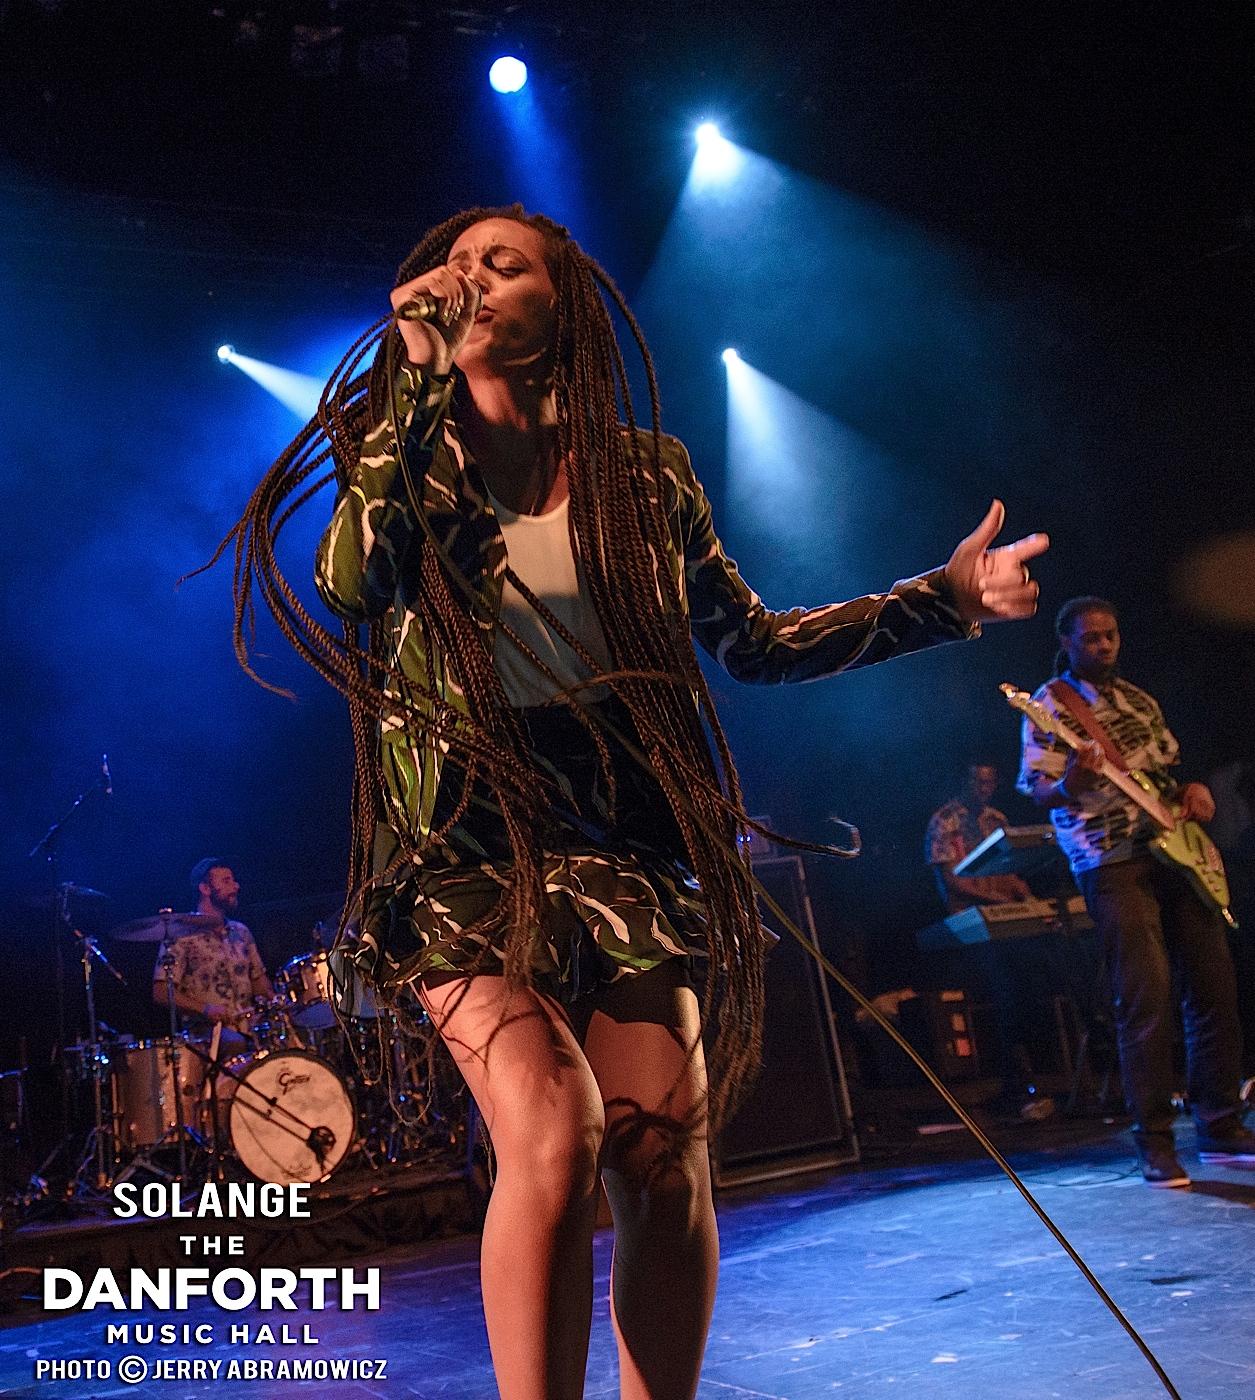 SOLANGE plays at The Danforth Music Hall Toronto.